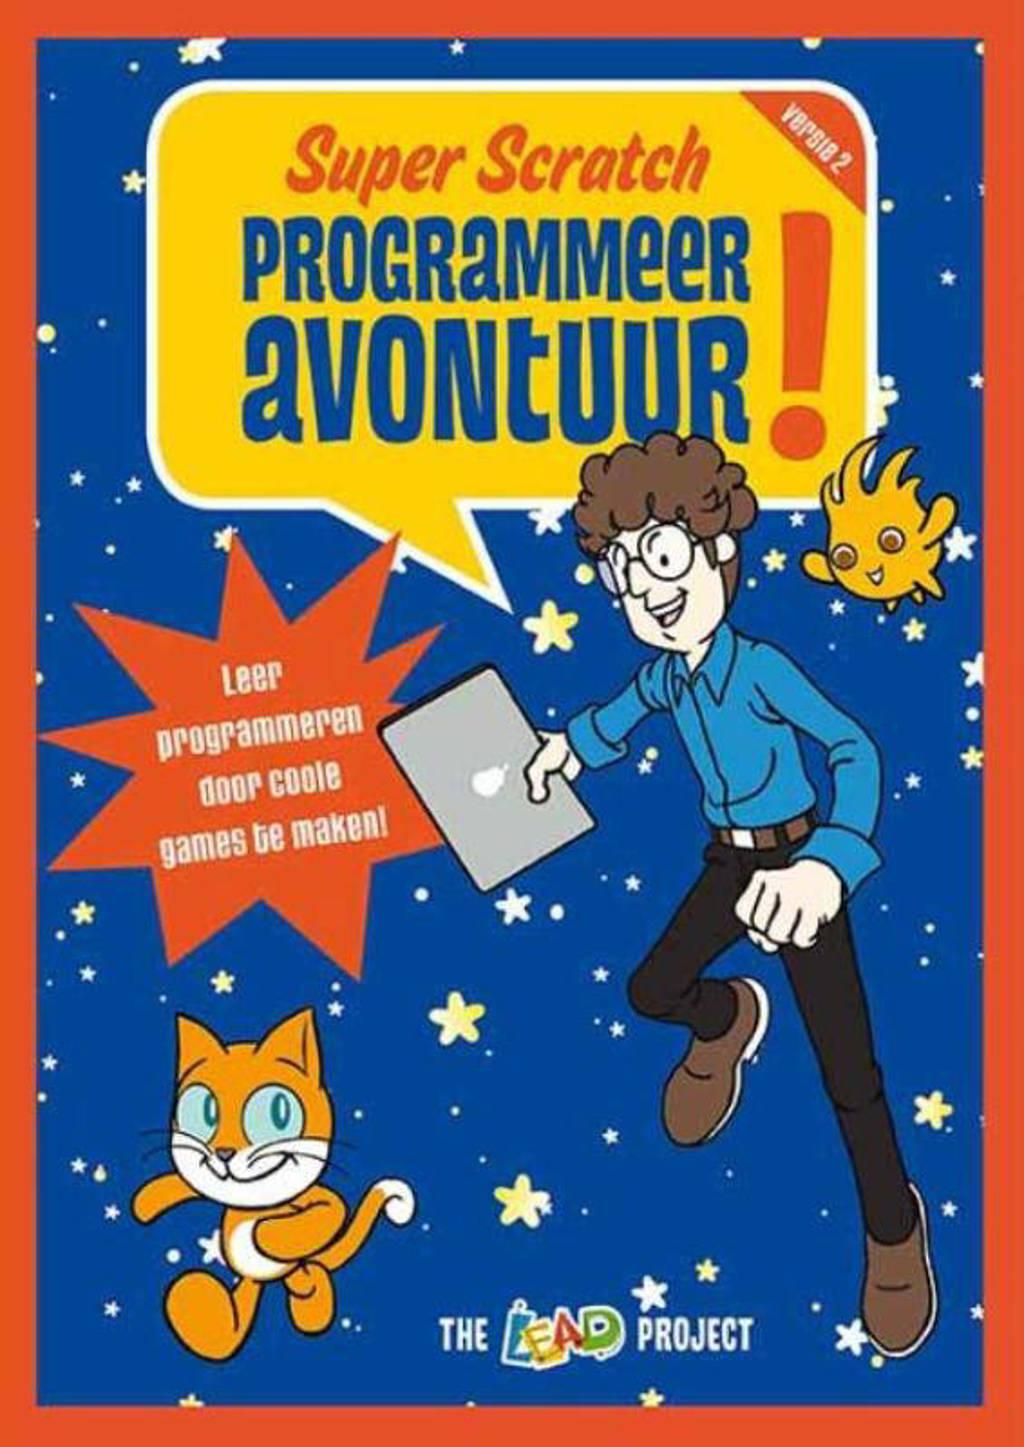 Super Scratch programmeeravontuur! - Lead-Project